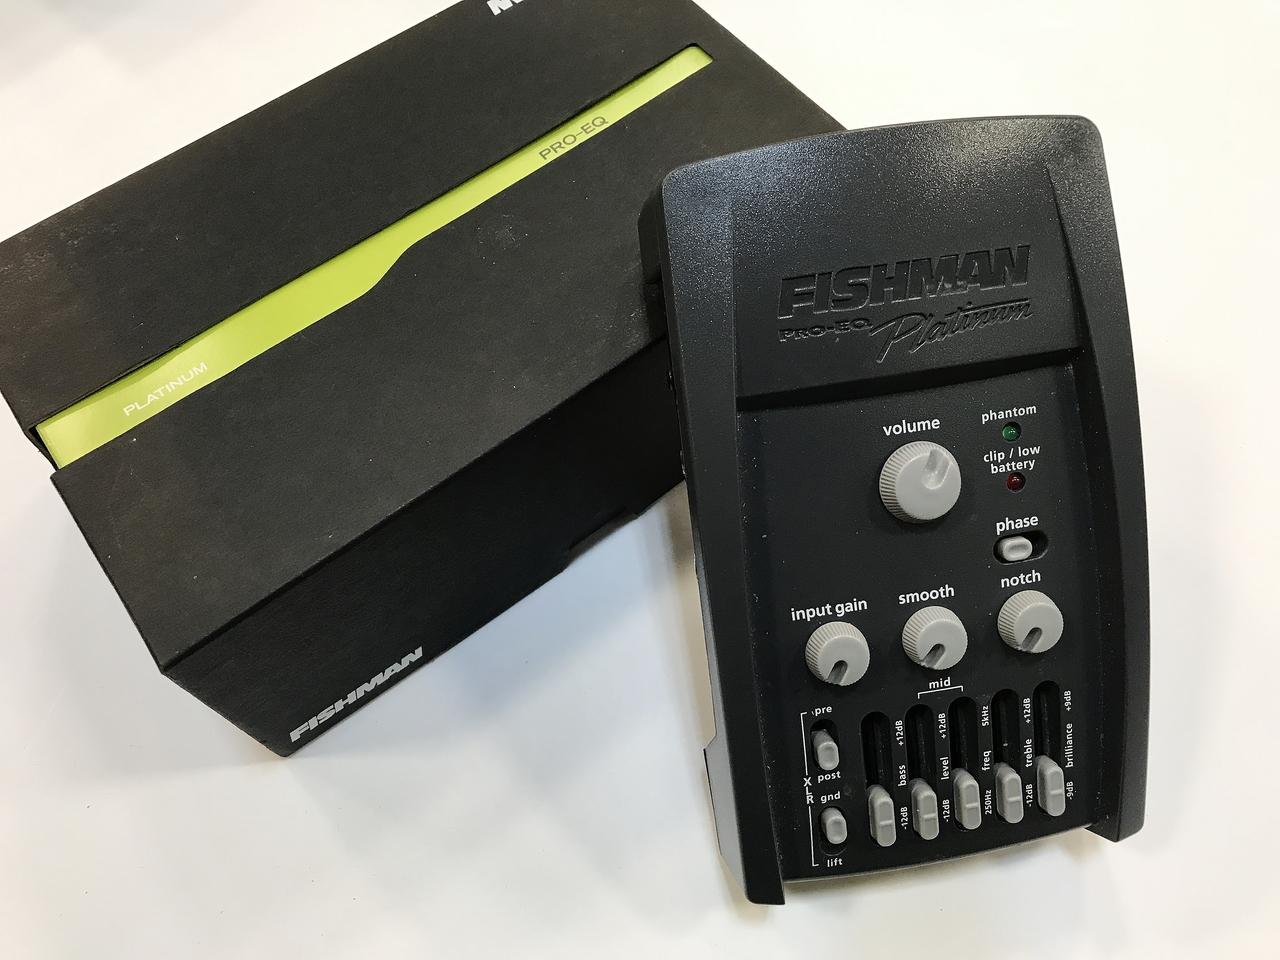 FISHMAN PRO-EQ Platinum [used beauty goods] [Motohakozuke] [acoustic guitar preamp]